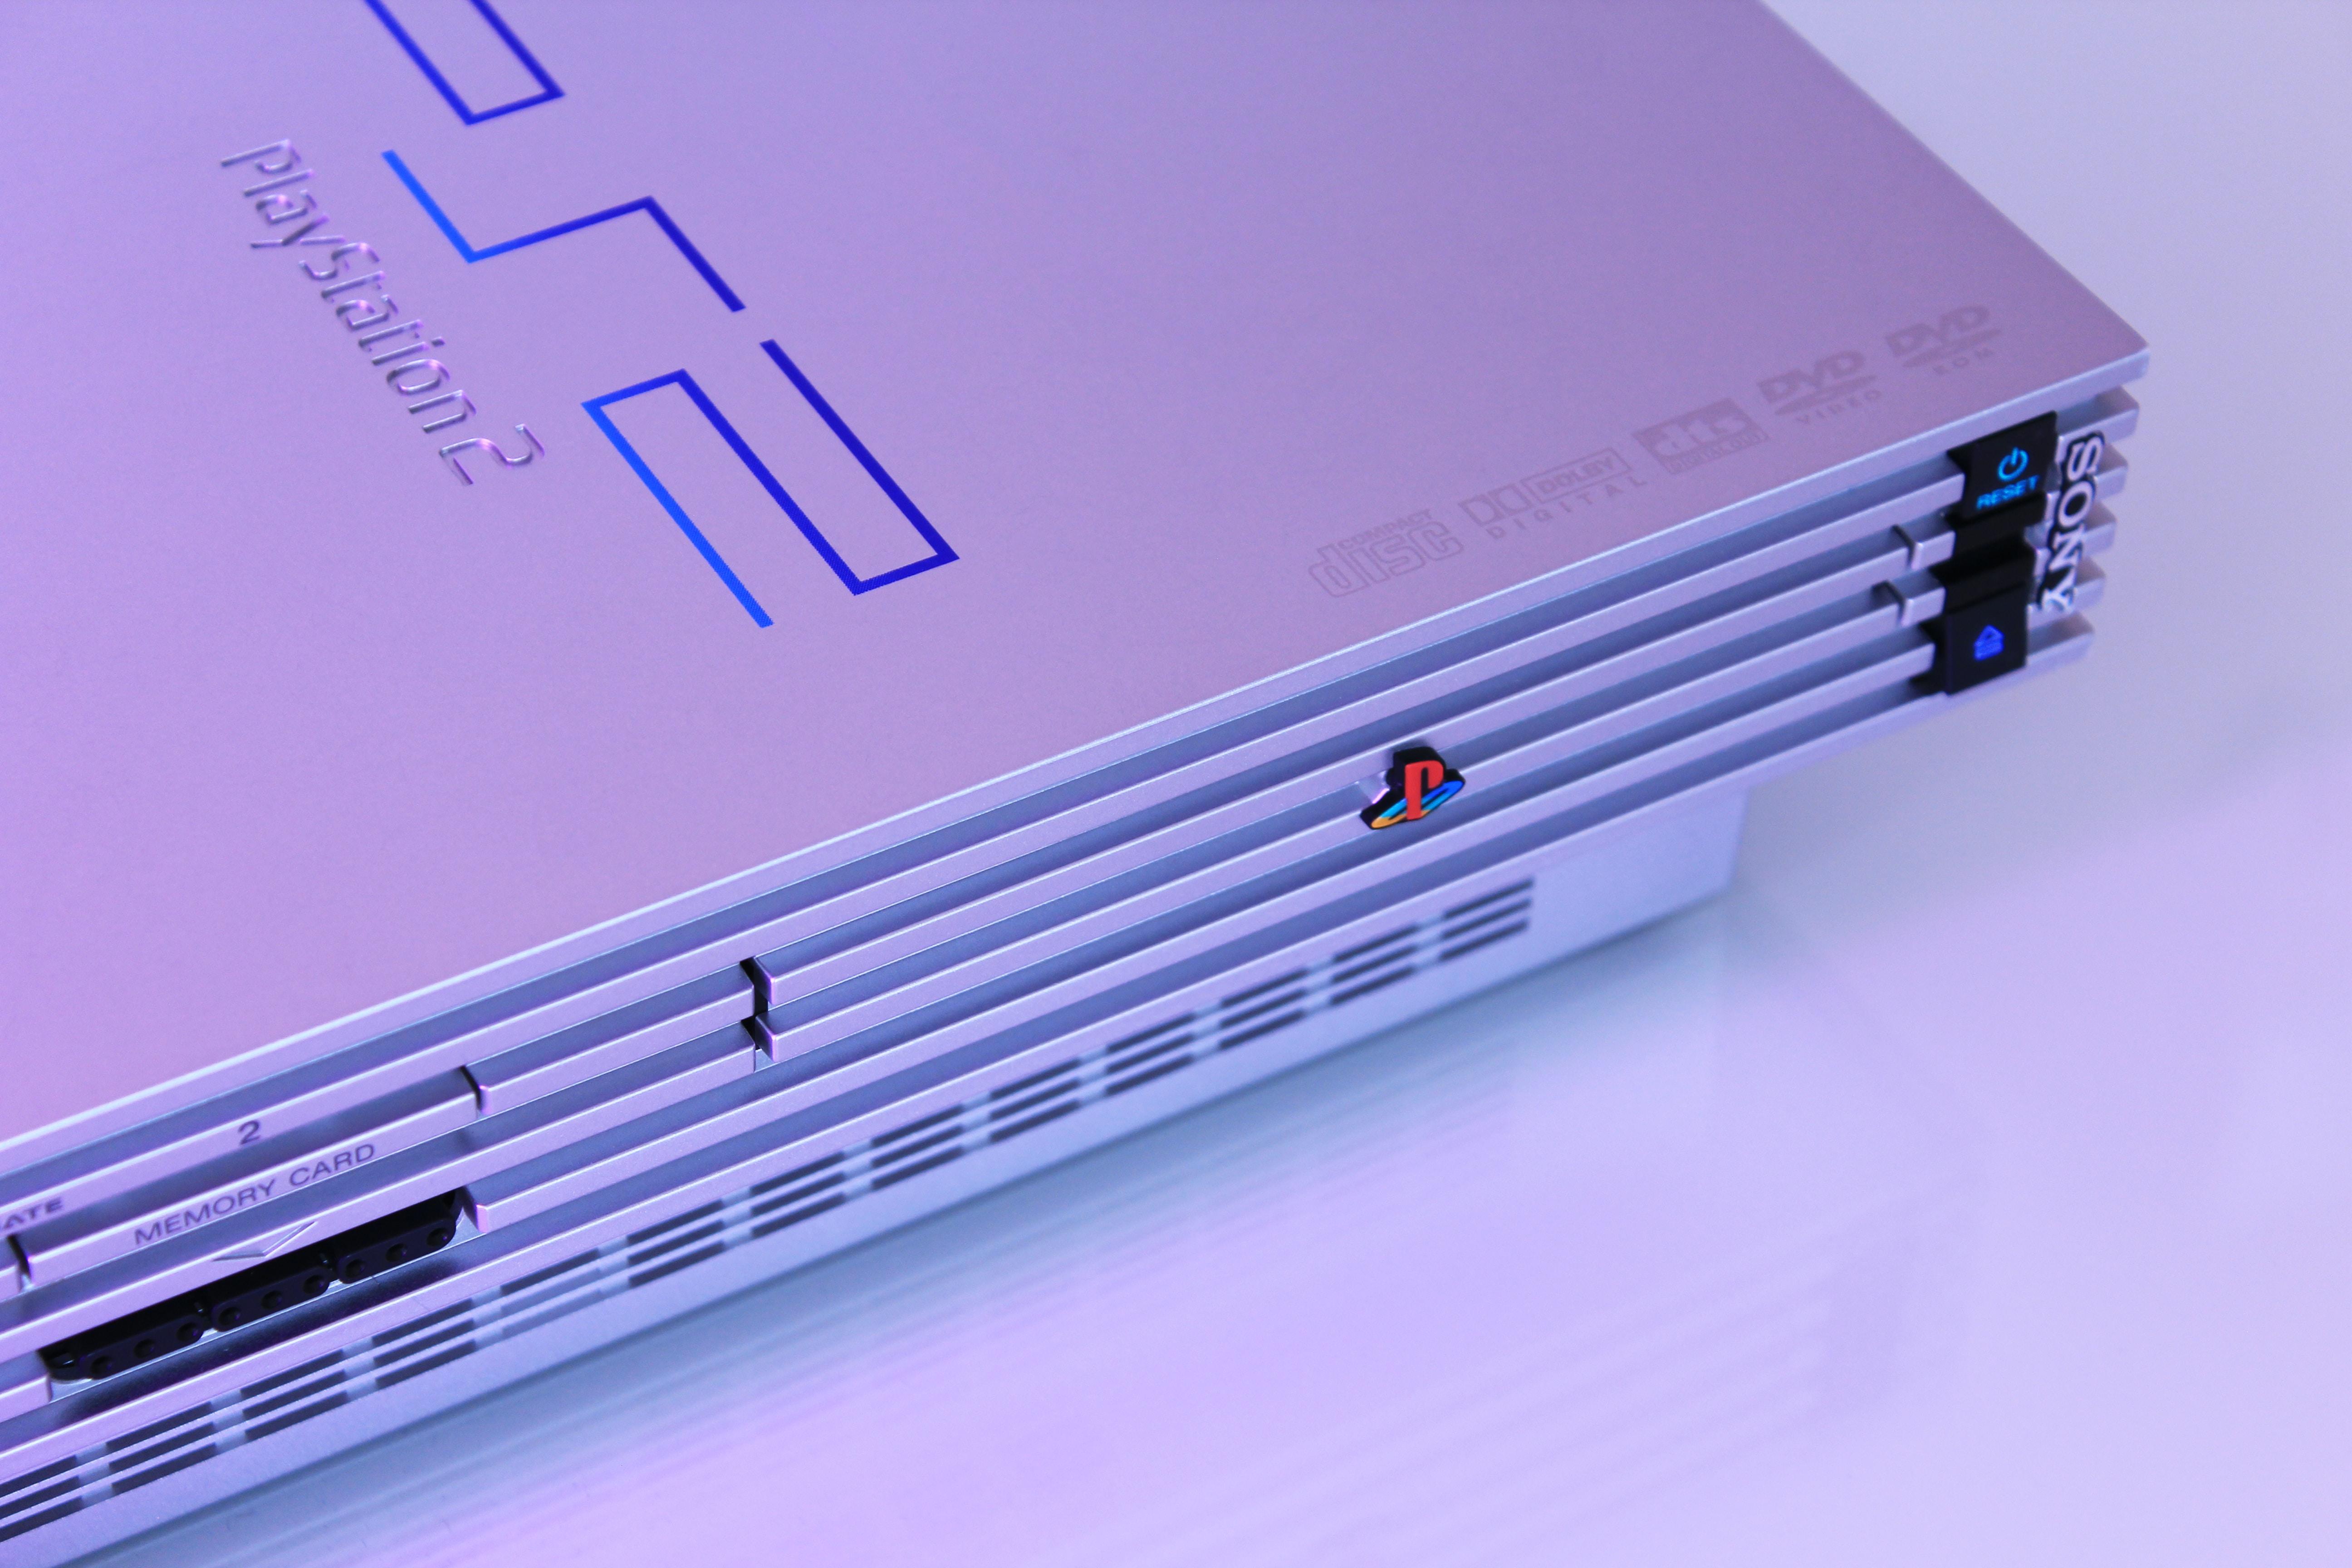 gray Sony PS2 console